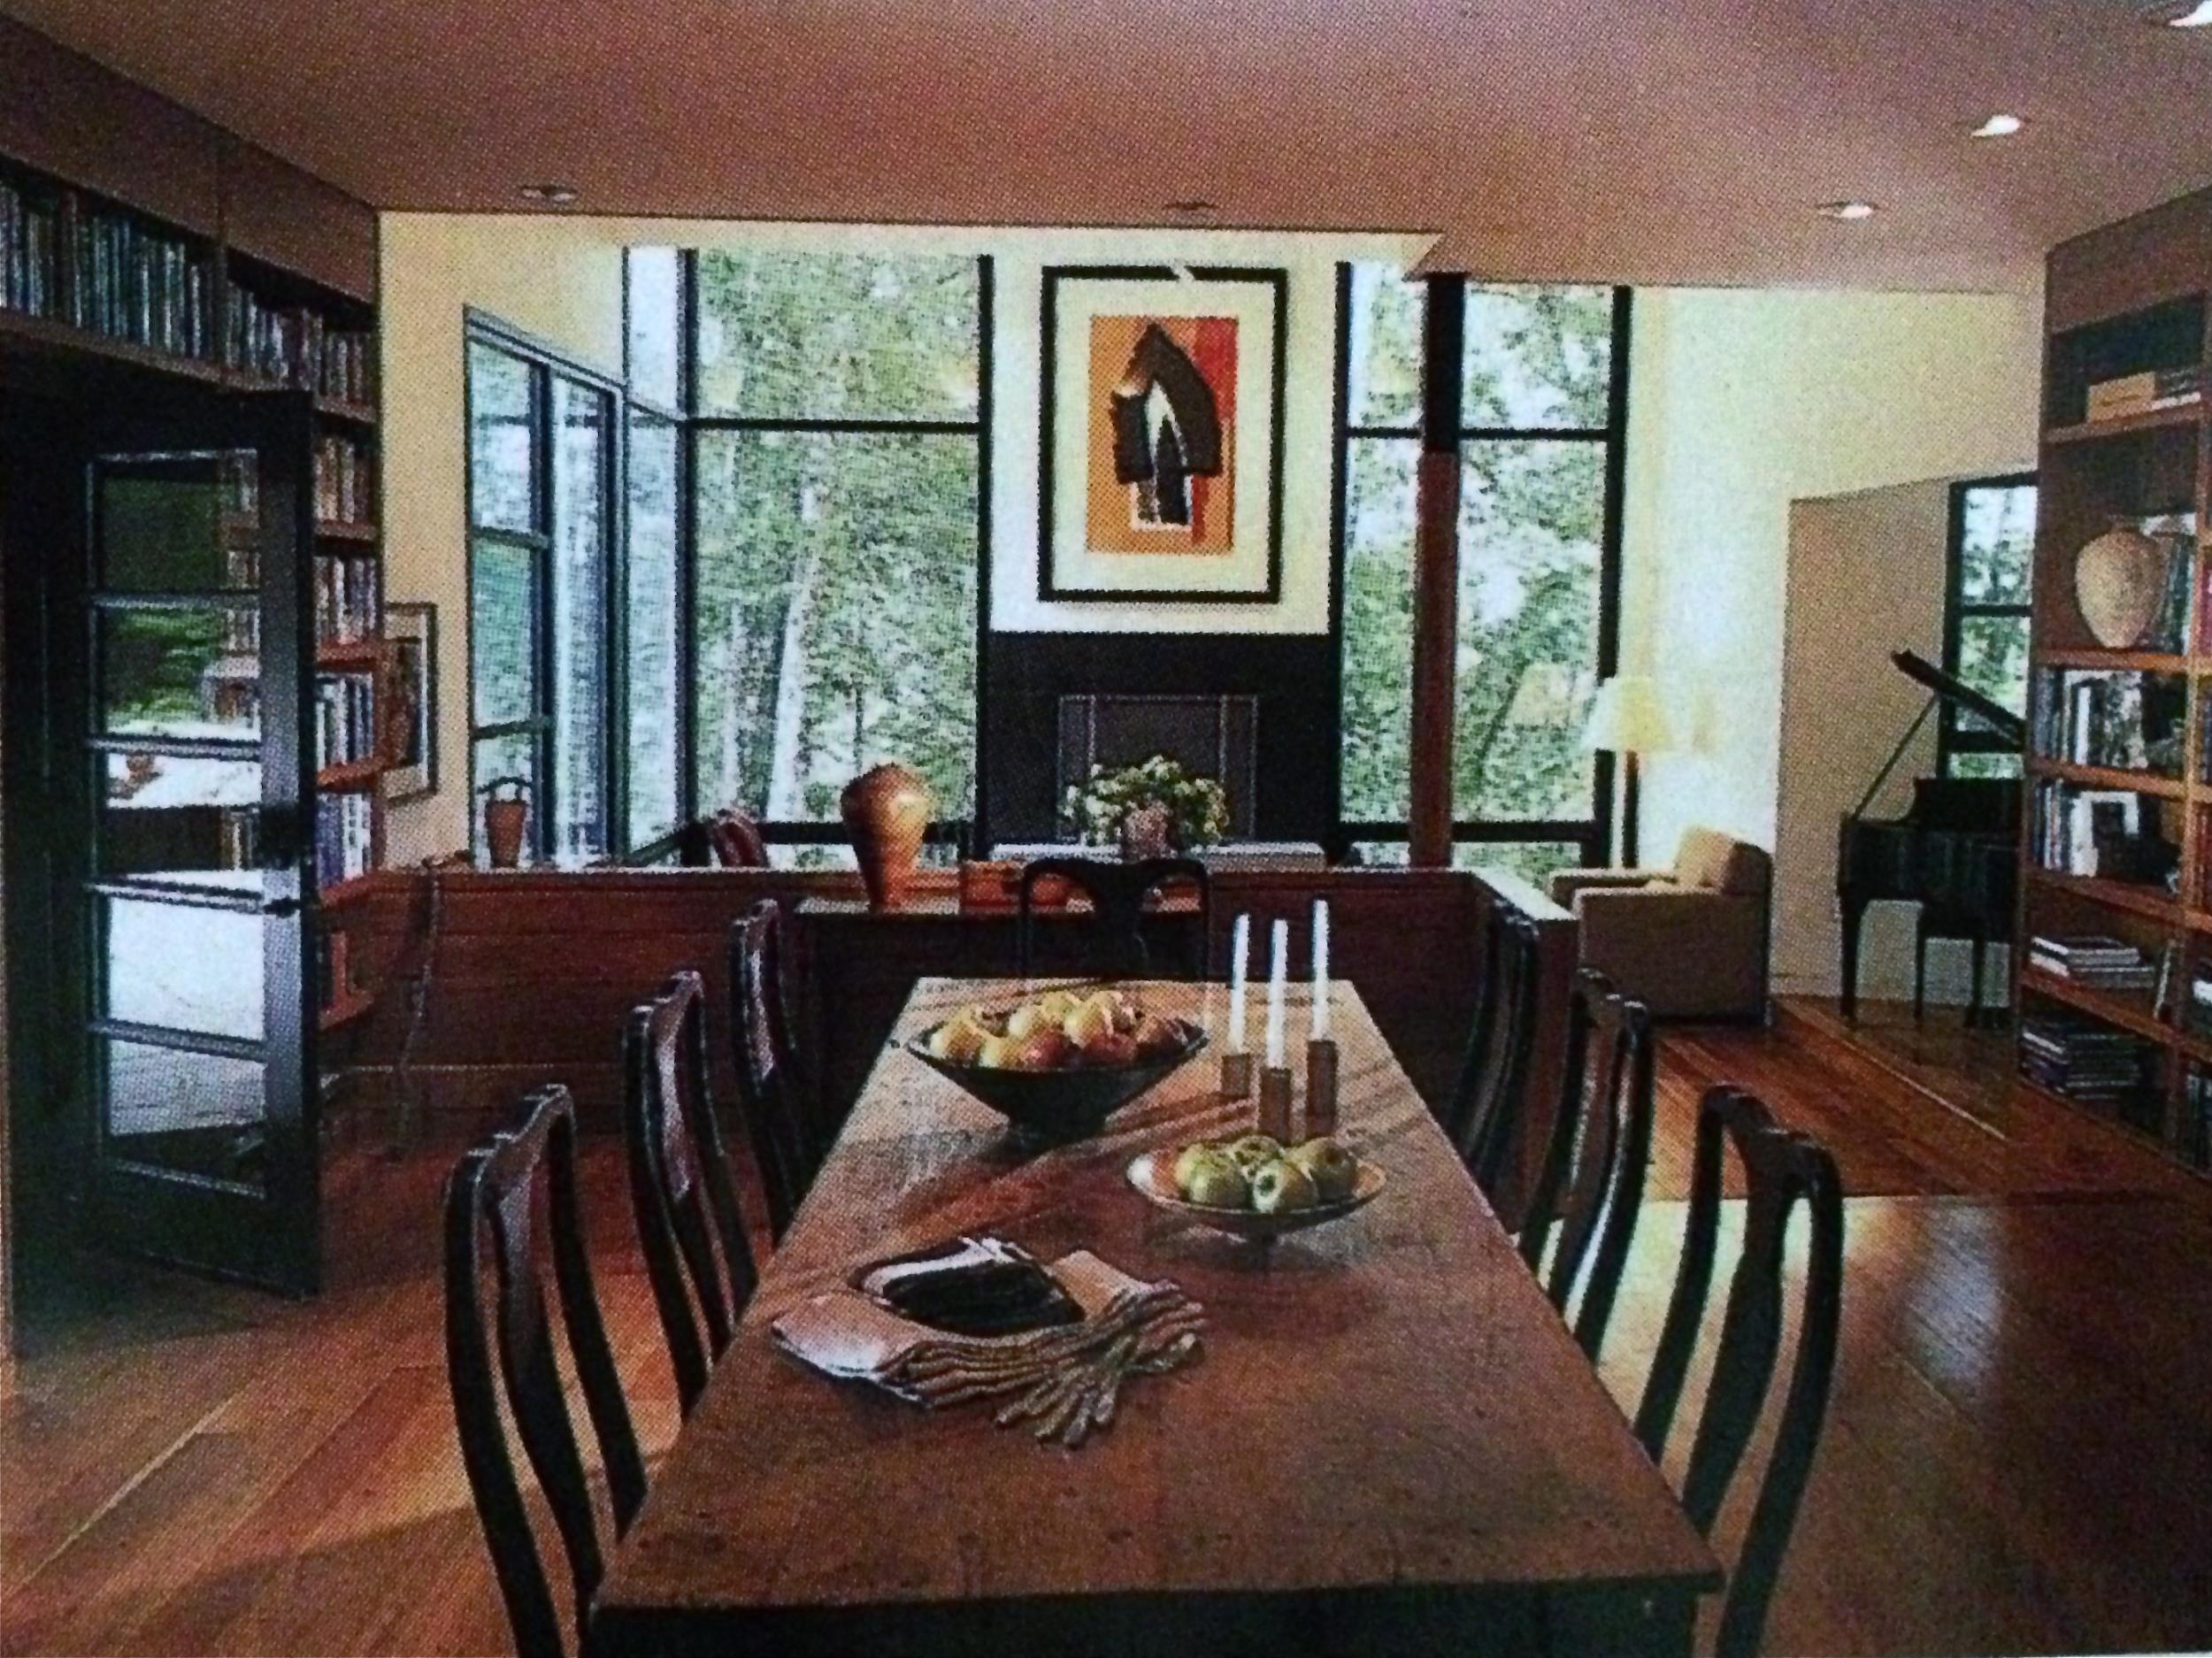 Dining room, West Virginia residence